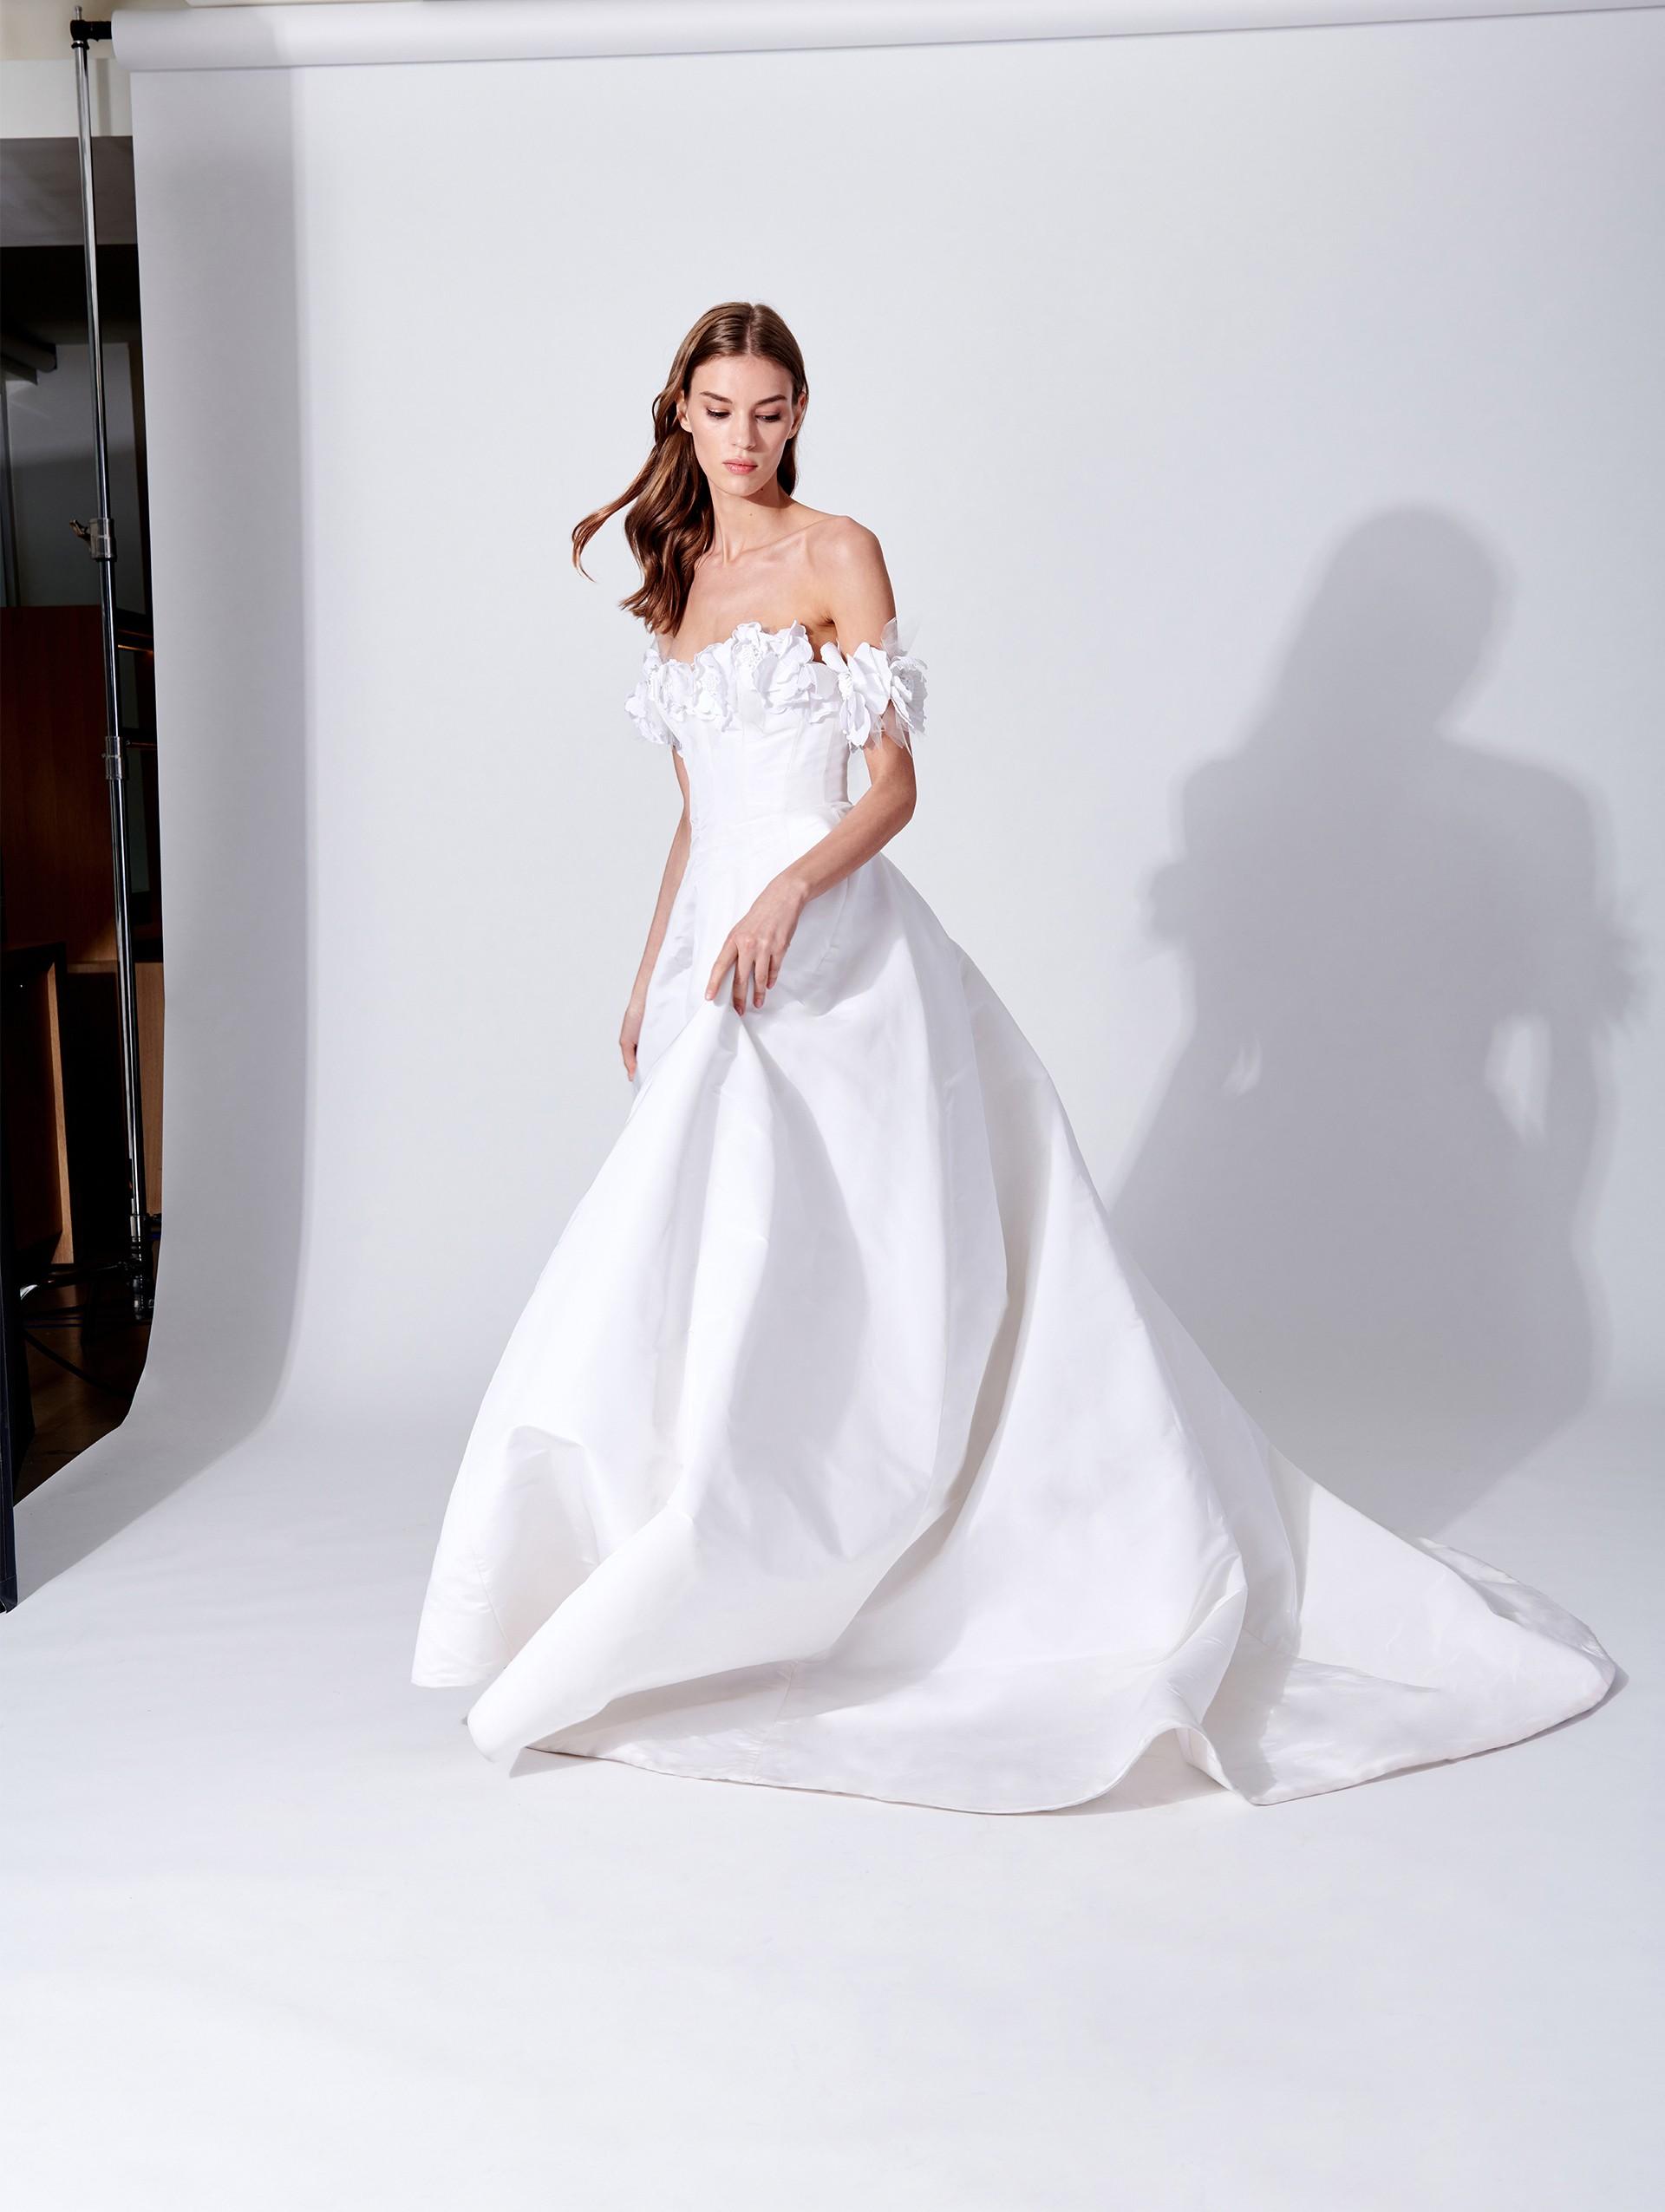 Vestito da sposa ampio in seta Oscar De La Renta 2019